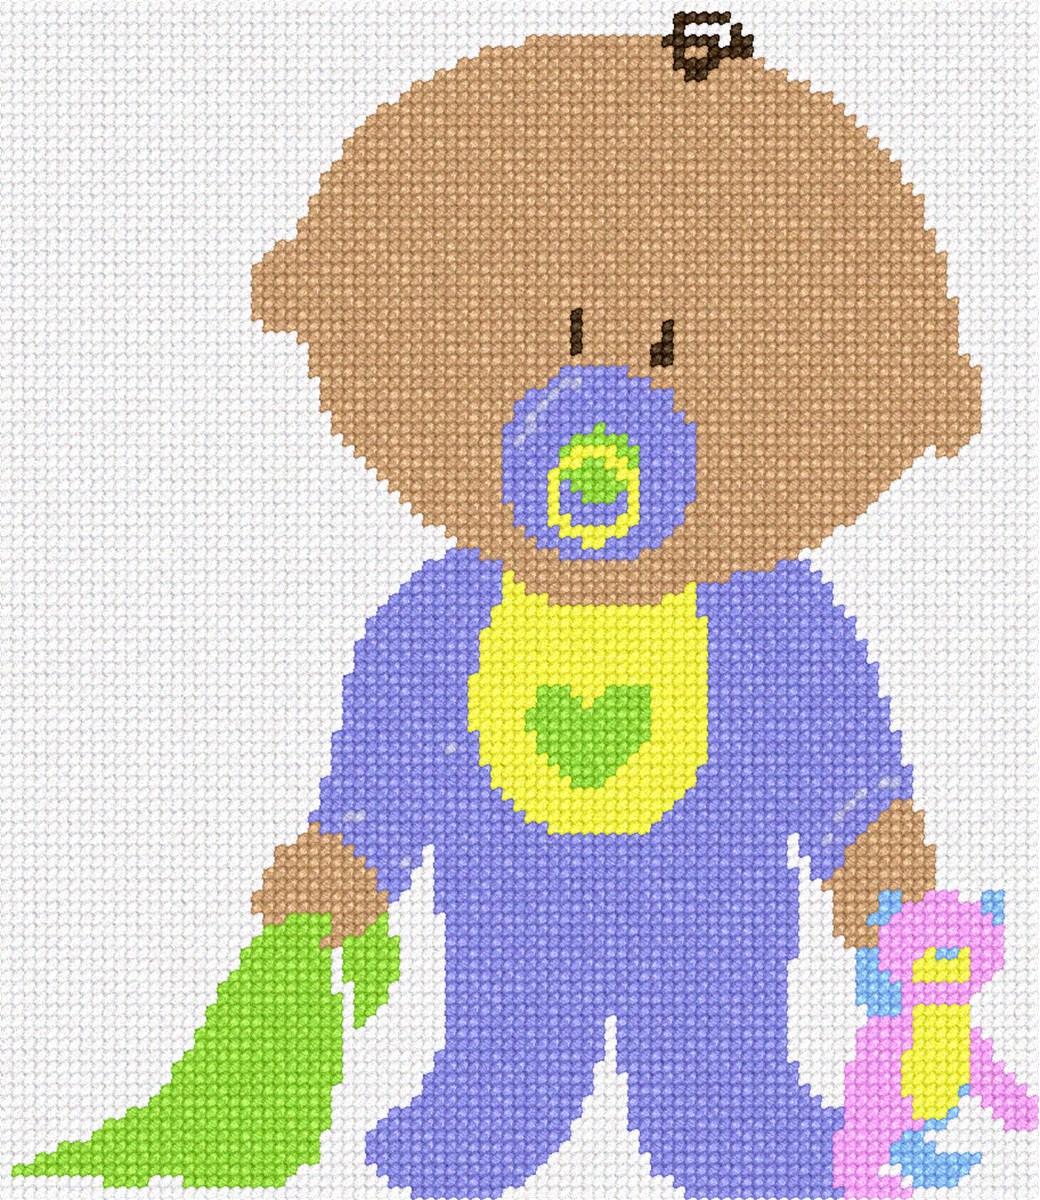 For Baby//Nursery//Kids Grey Chevron Baby Boy Crib Needlepoint Kit or Canvas